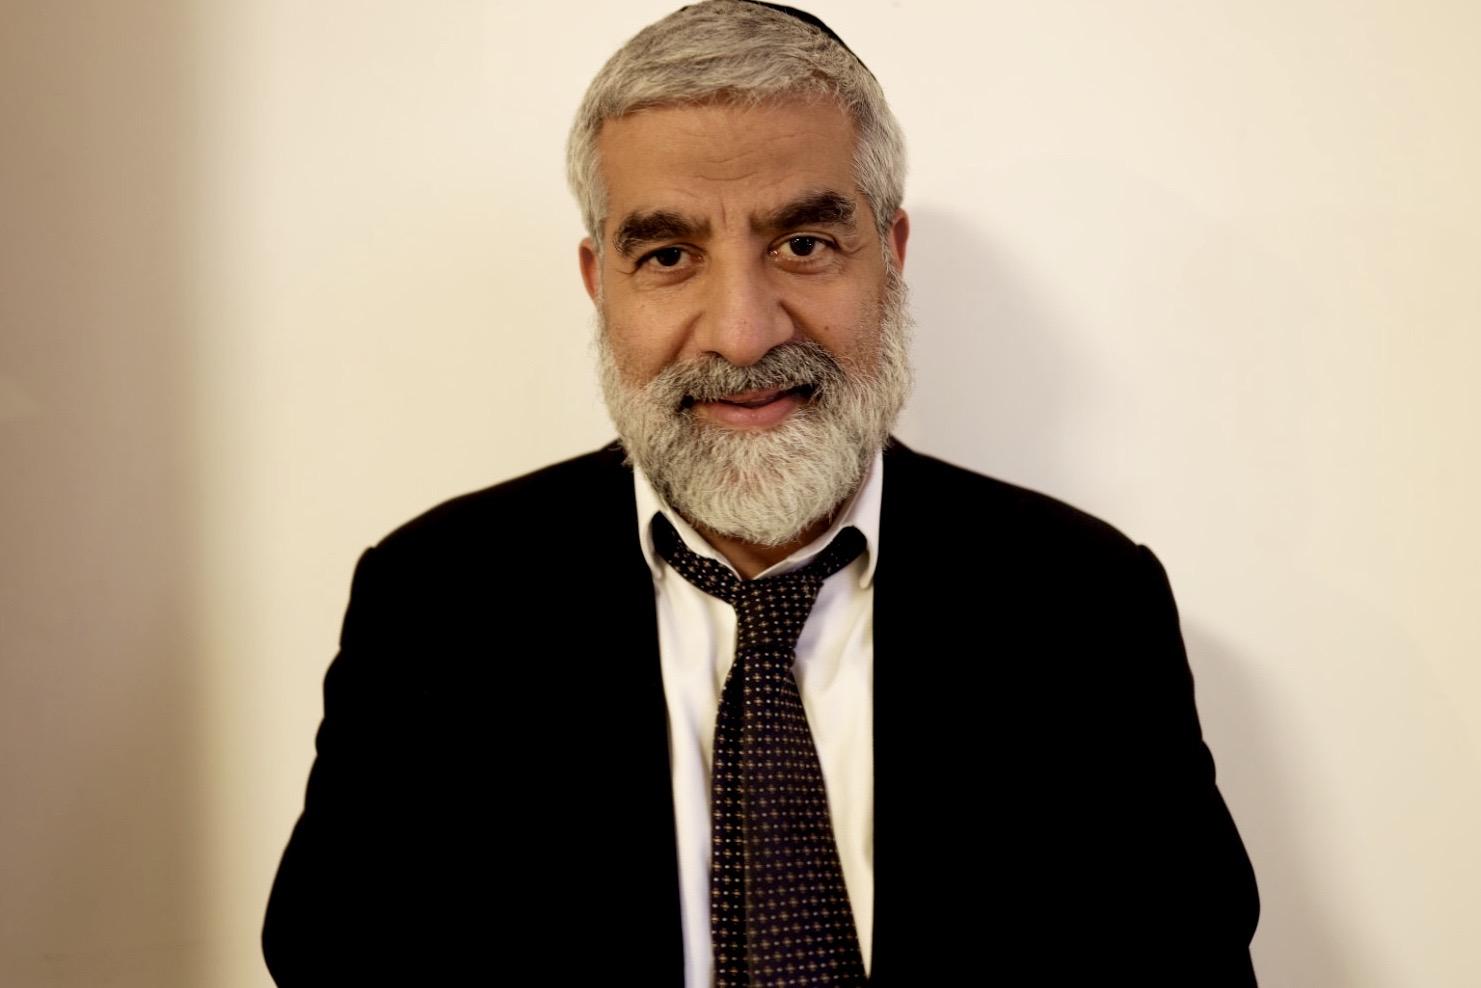 Rabbi Yosef Cohen